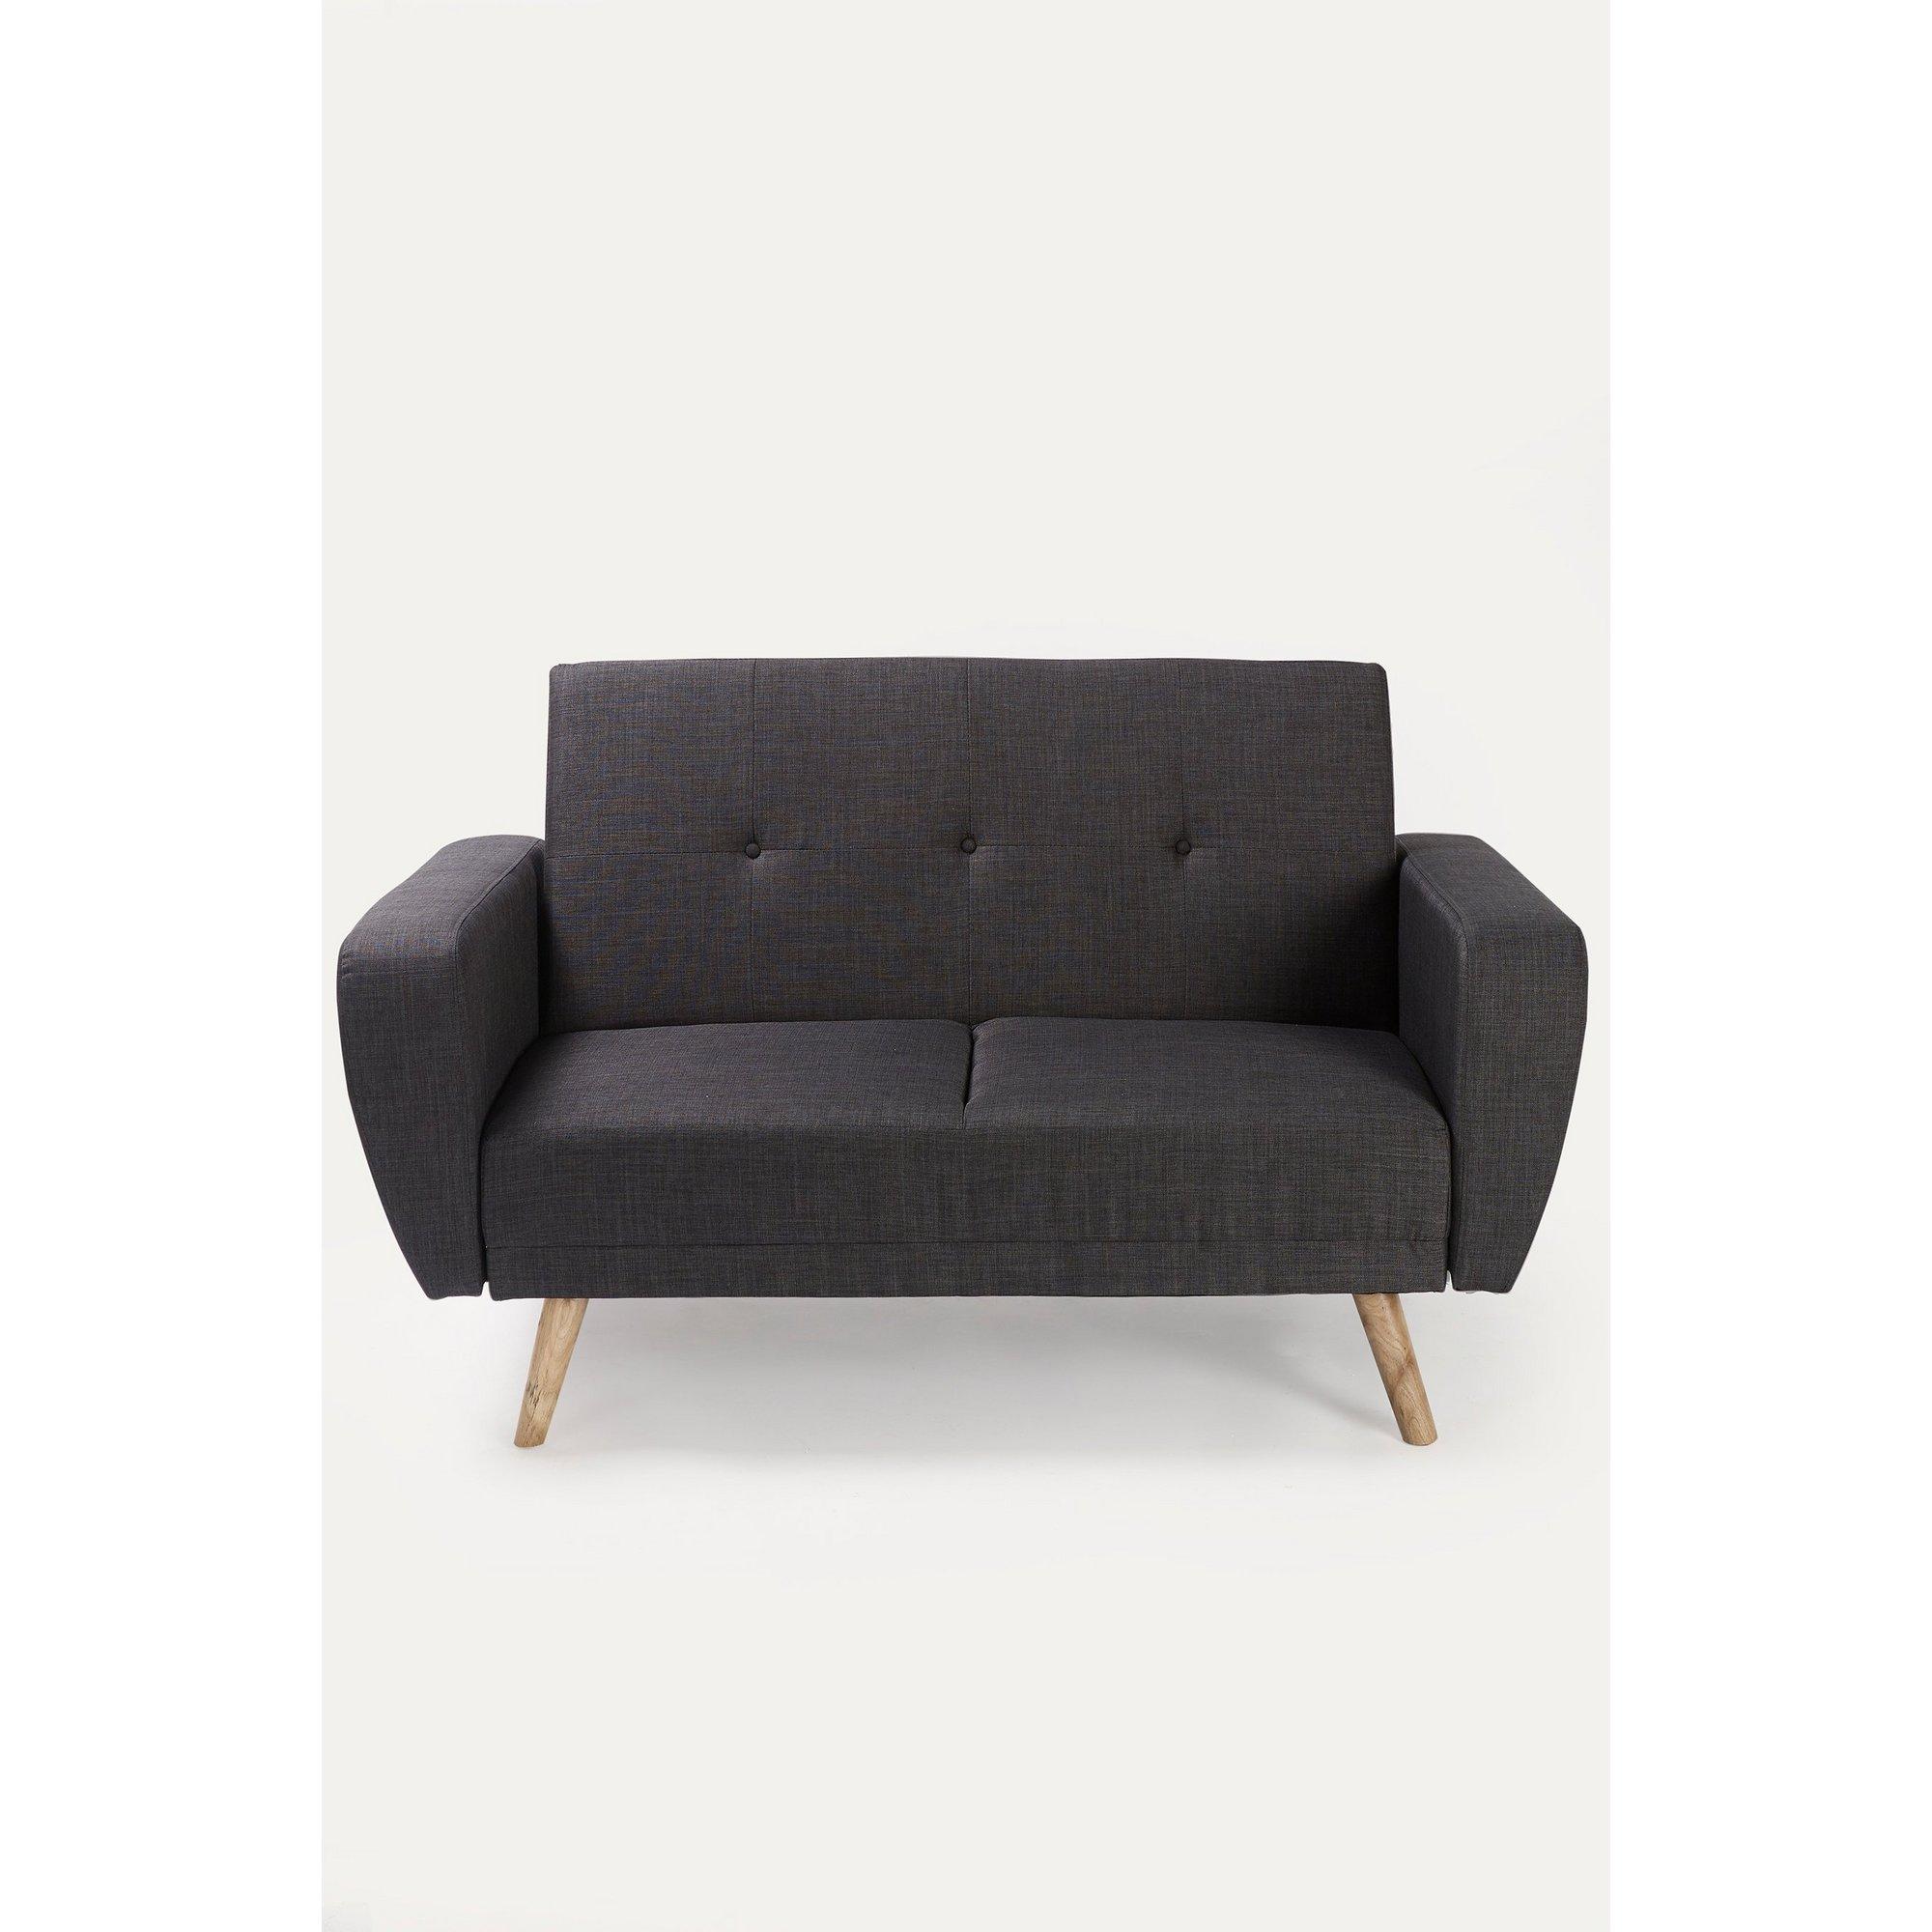 Image of Farrow Medium Sofa Bed